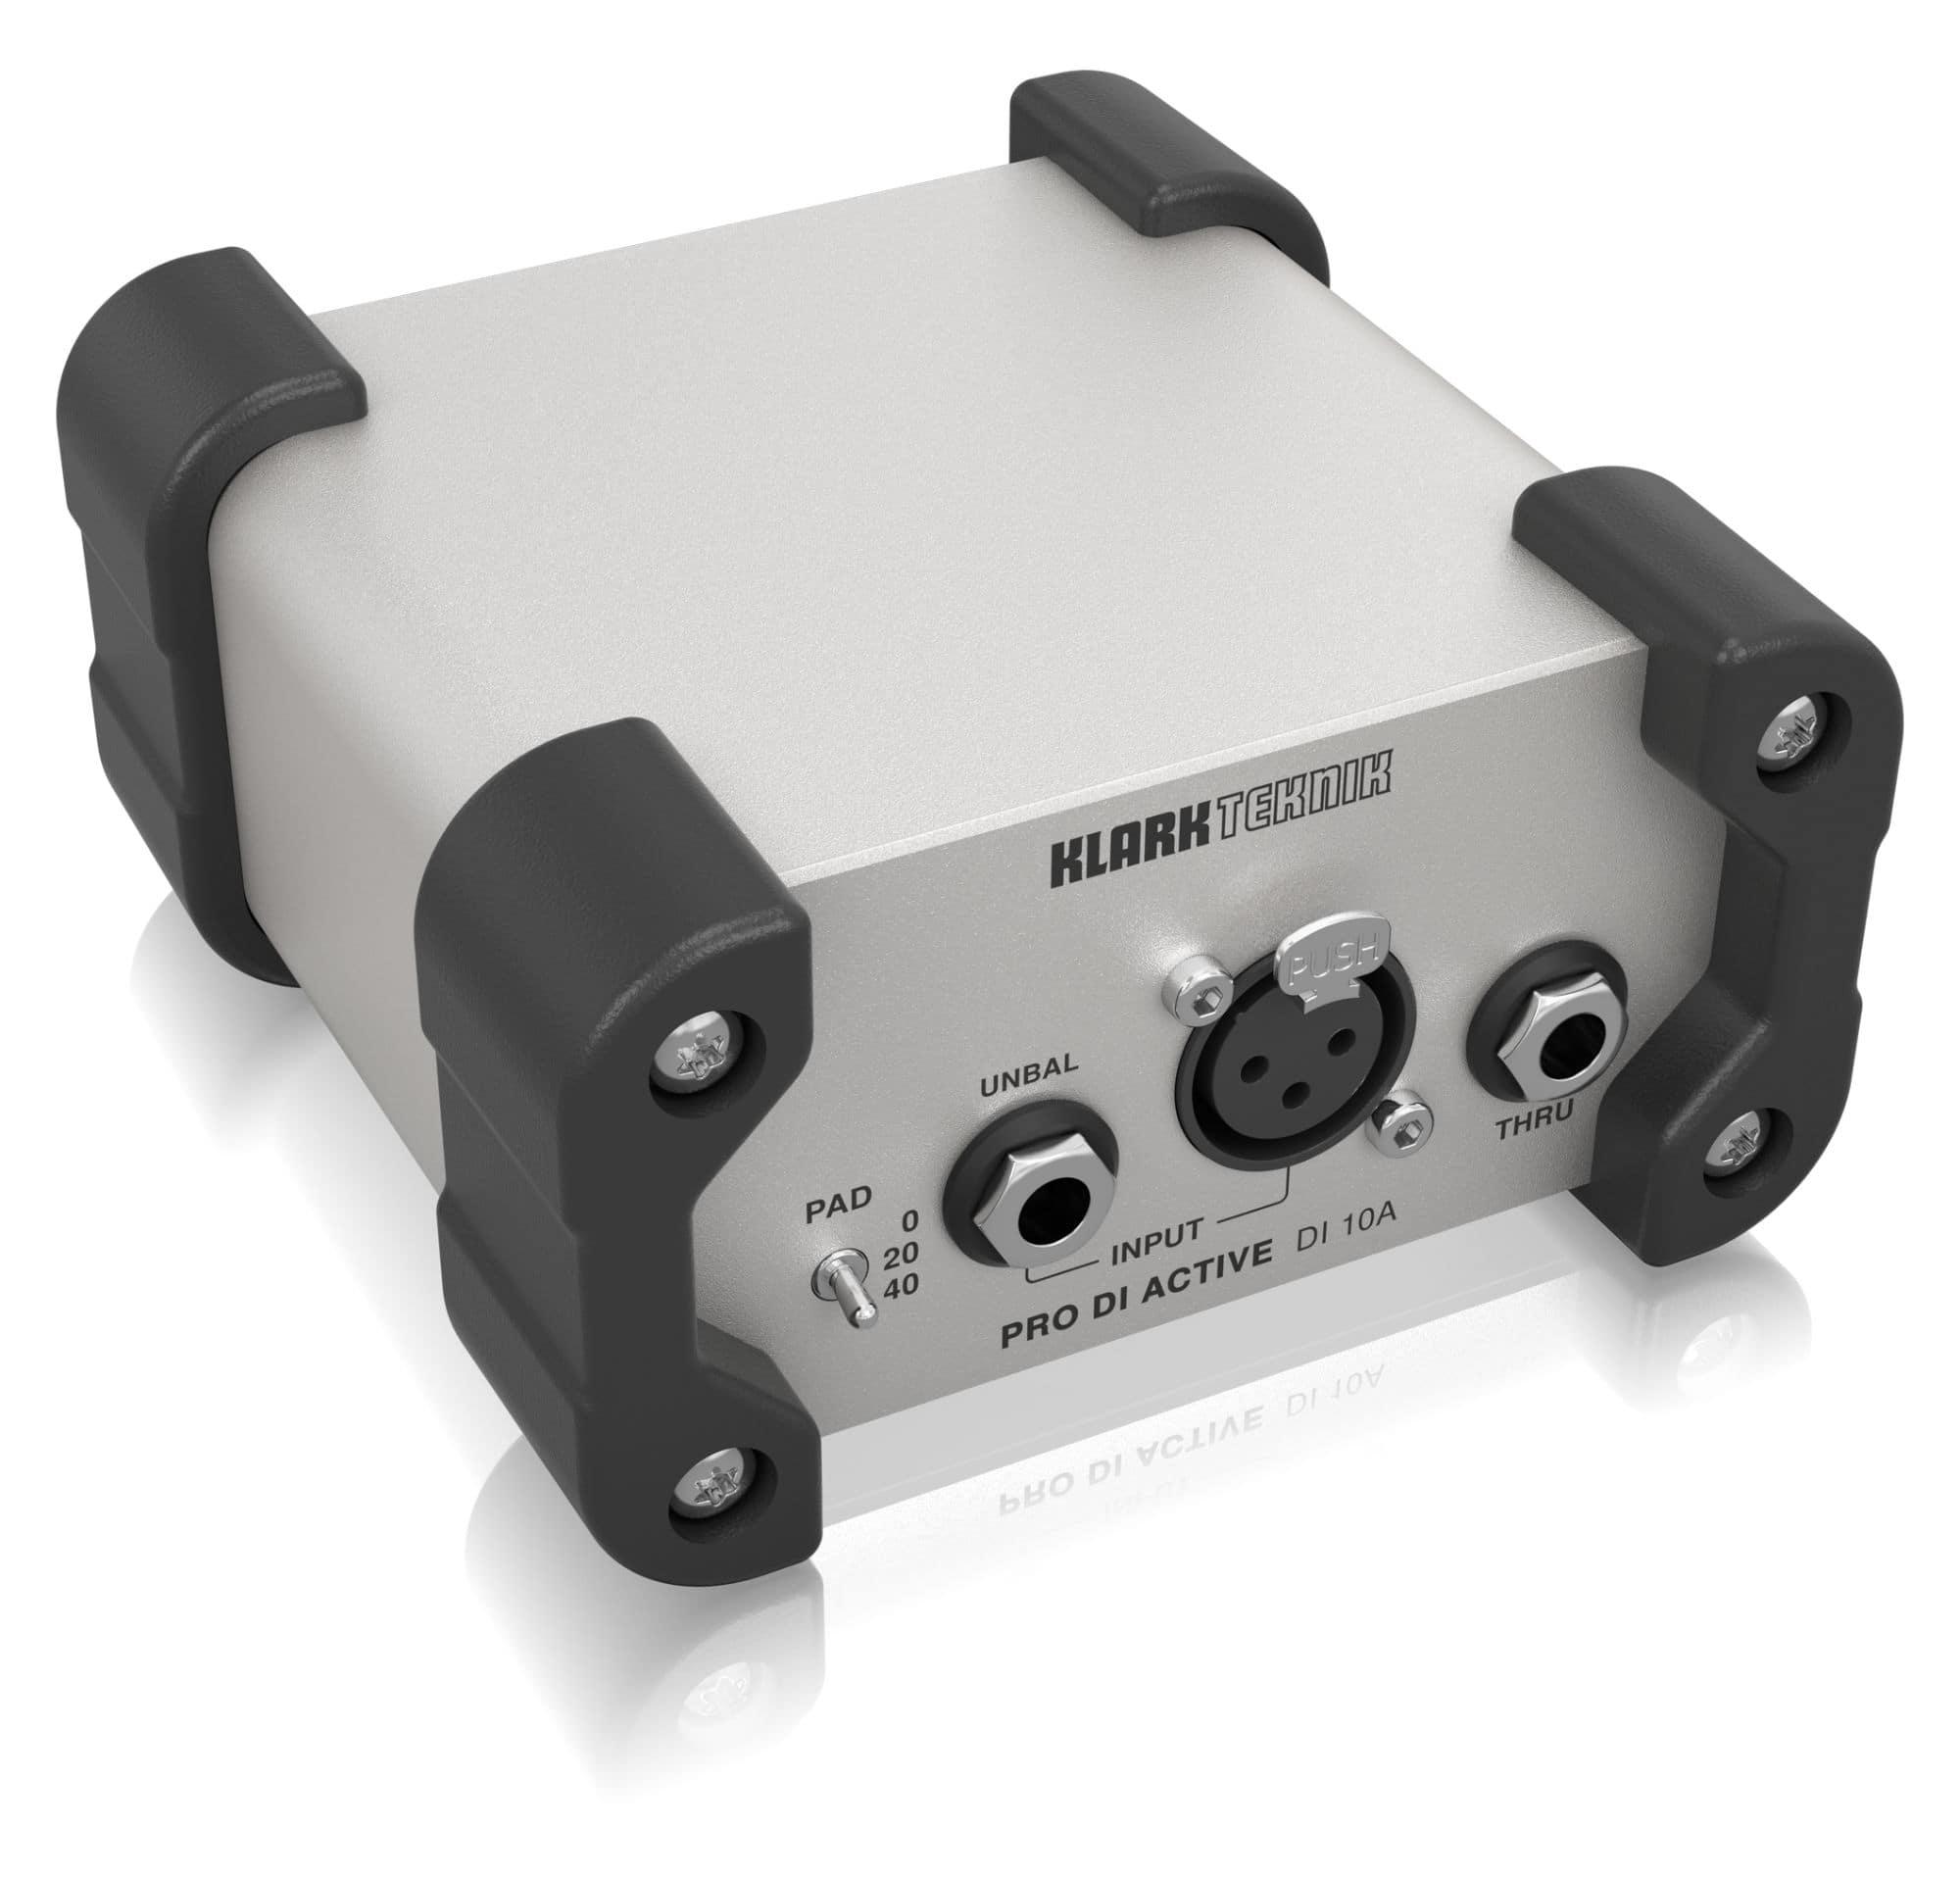 Diboxen - Klark Teknik DI 10A - Onlineshop Musikhaus Kirstein